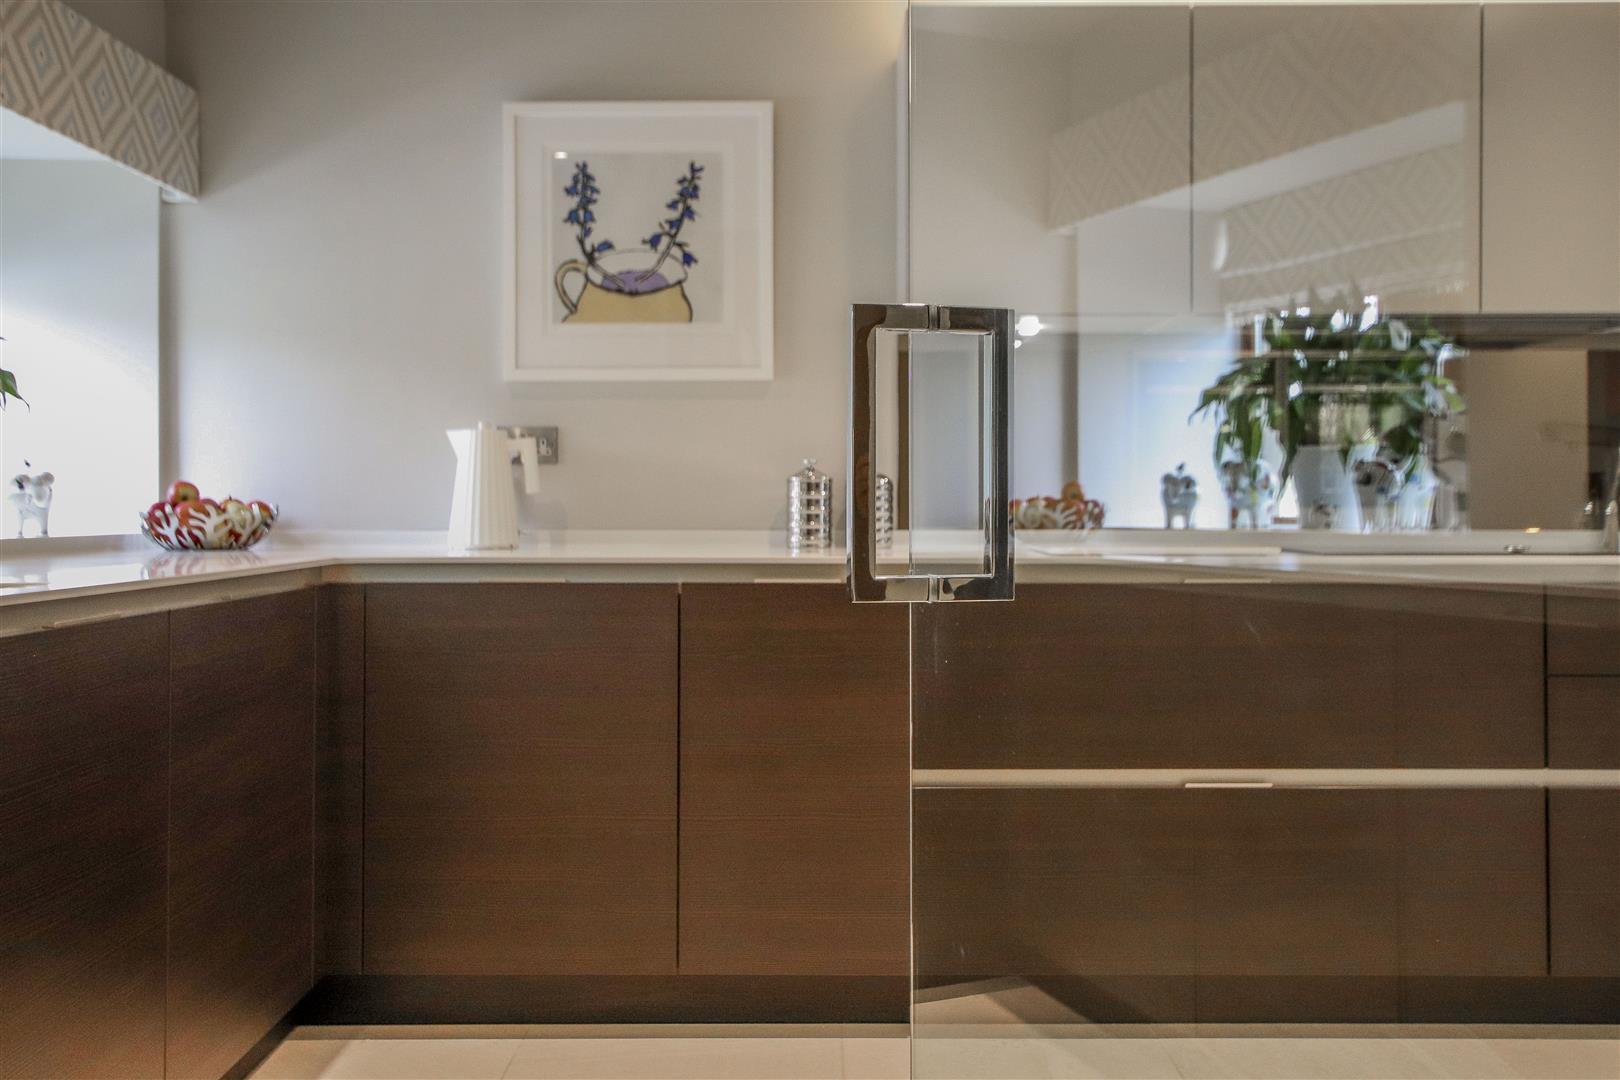 5 Bedroom Semi-detached House For Sale - 45.JPG